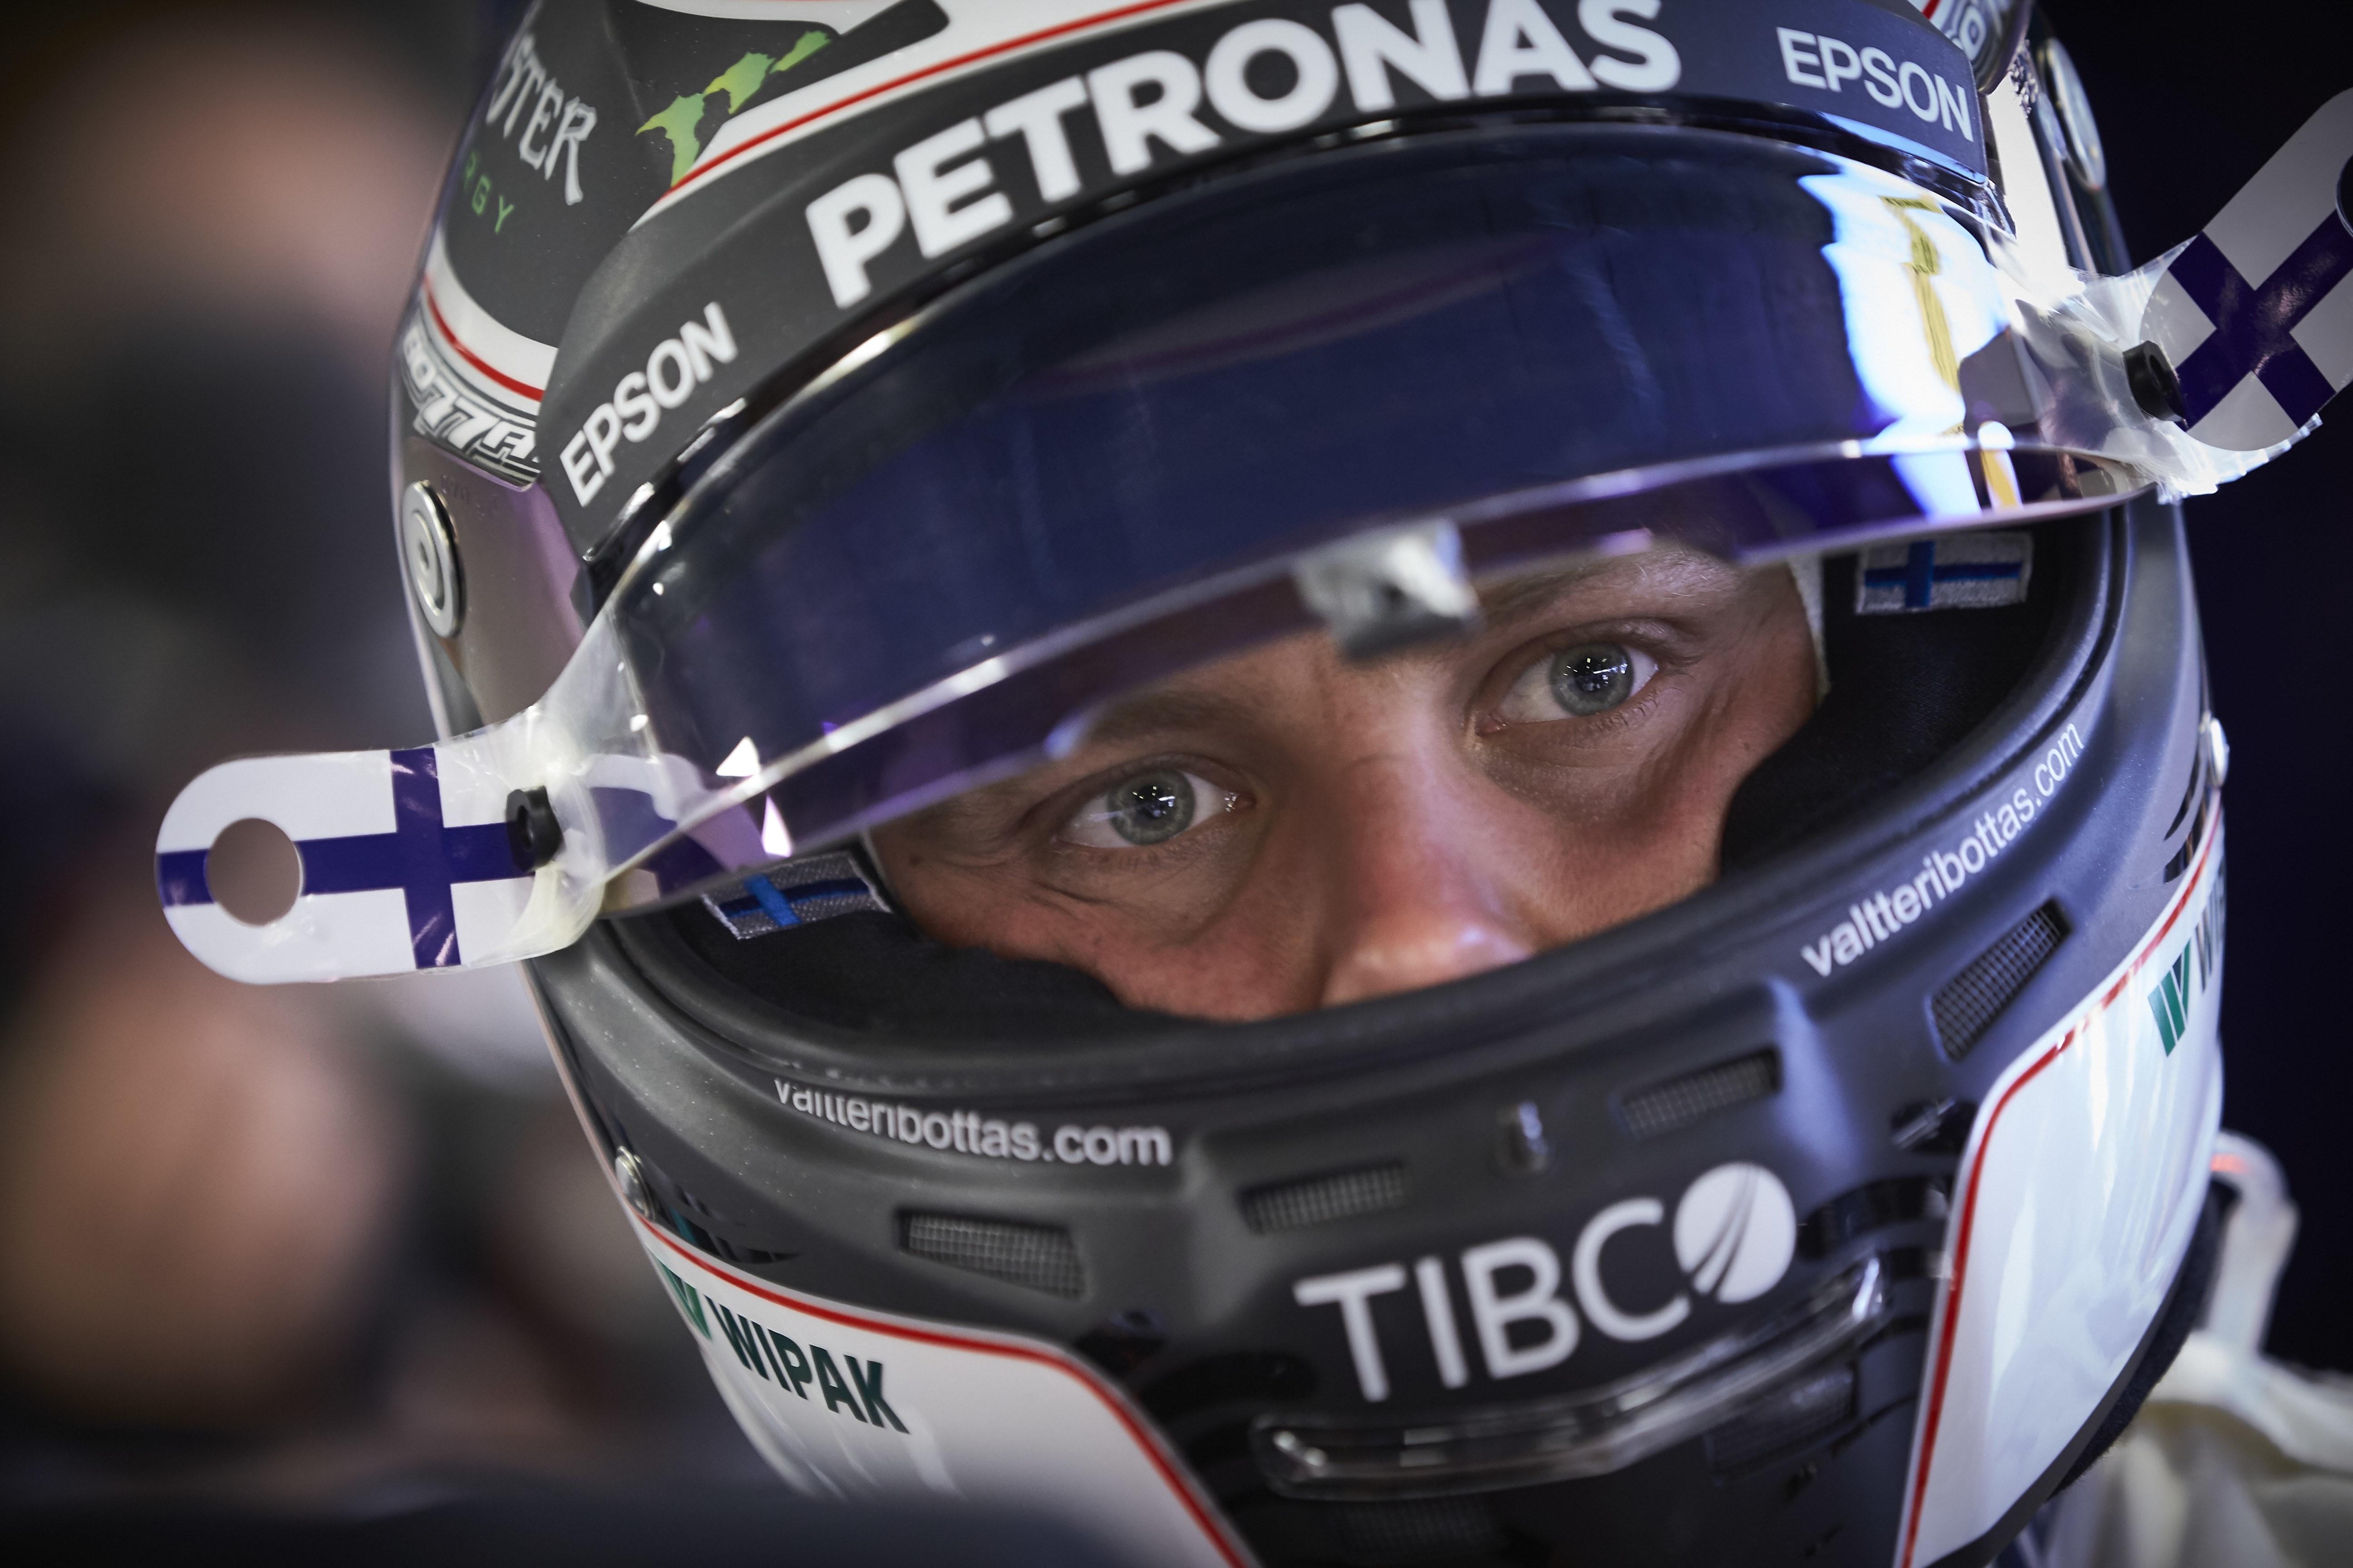 Valtteri Bottas (Mercedes) au Grand Prix d'Espagne 2017